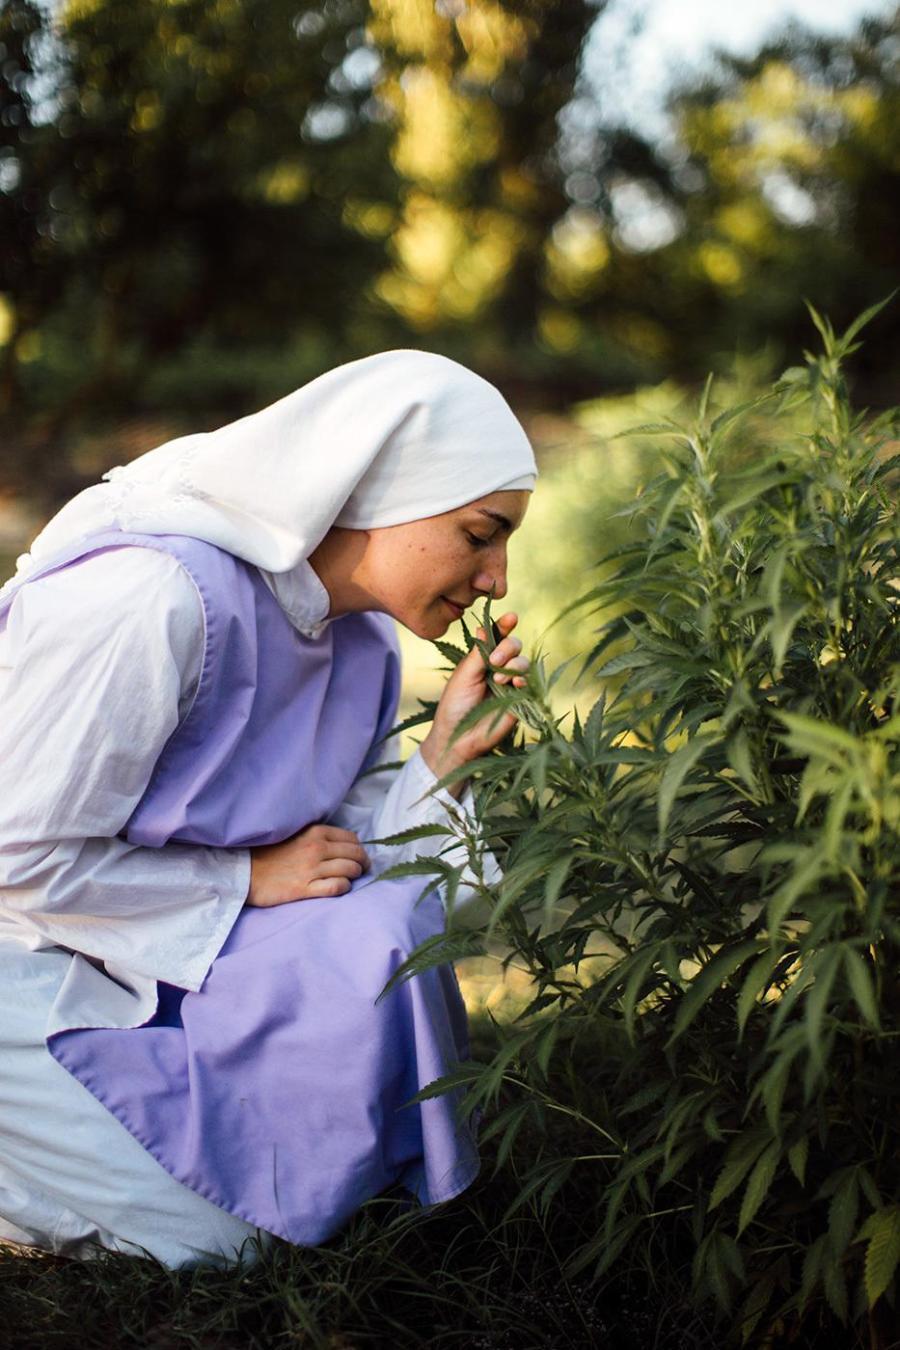 monjas marihuana porros california estados unidos cannabis